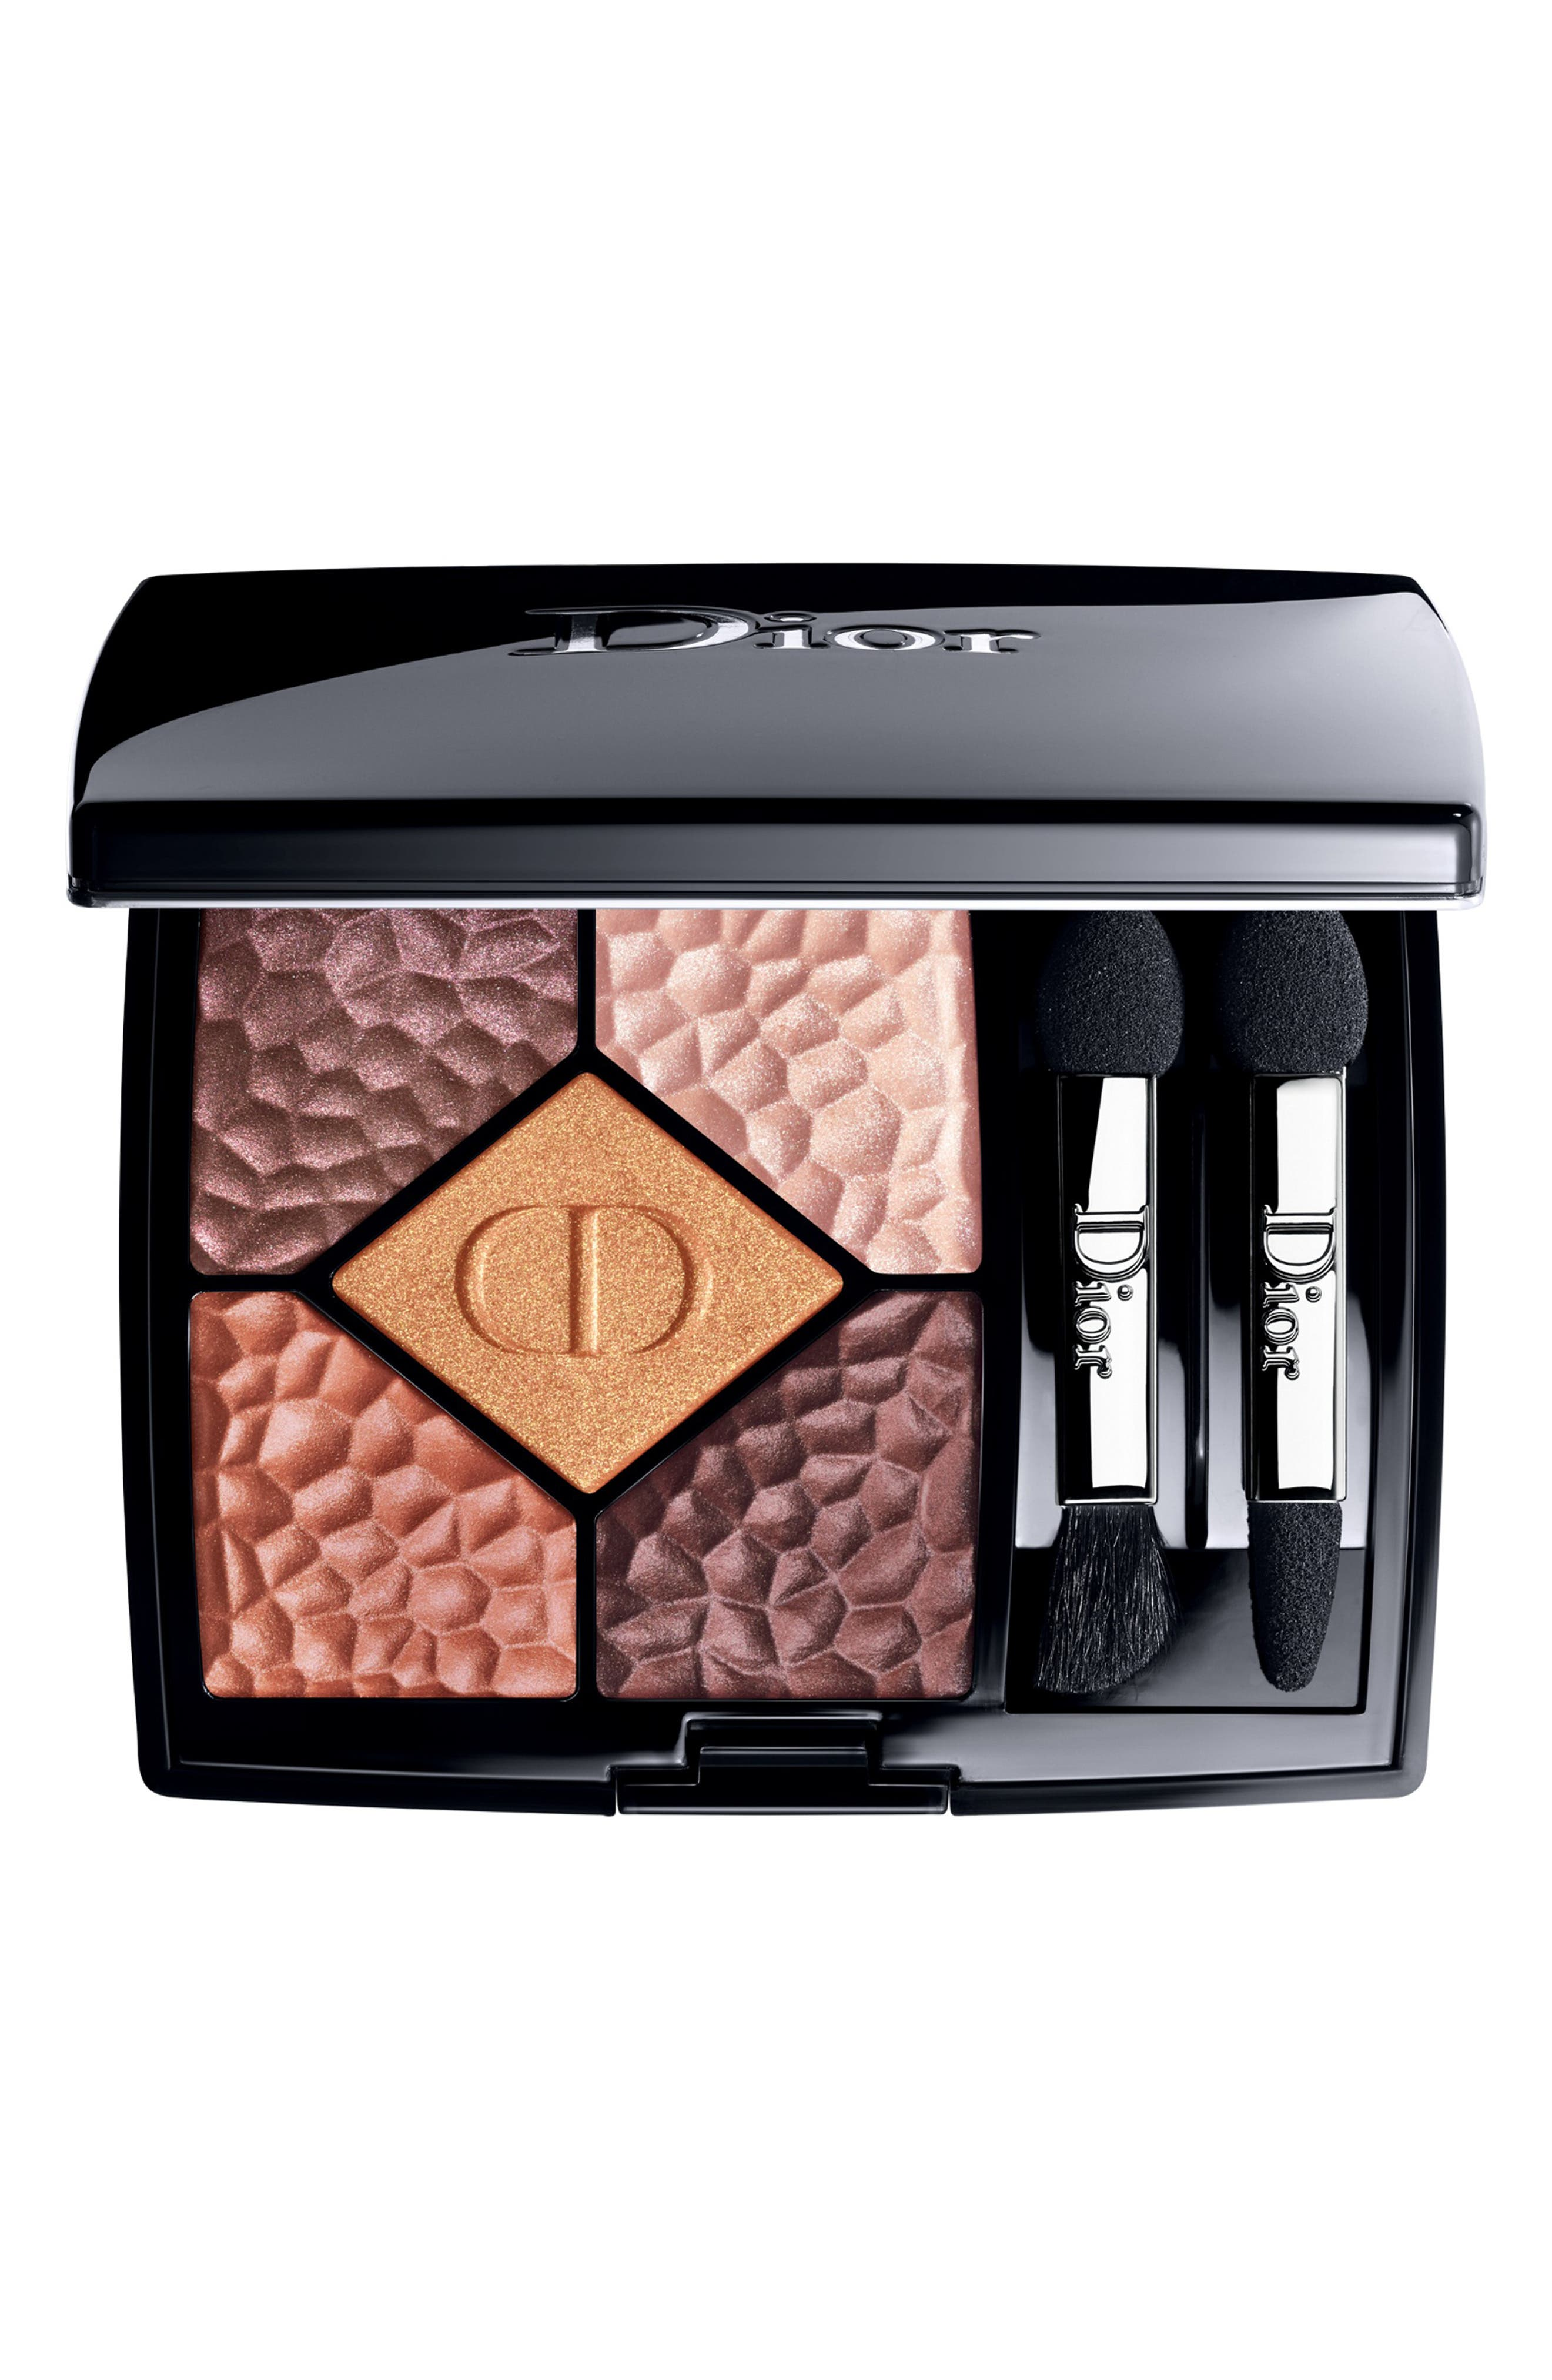 DIOR Diorshow 5 Couleurs Colors & Effects Eyeshadow Palette, Main, color, 786 TERRA